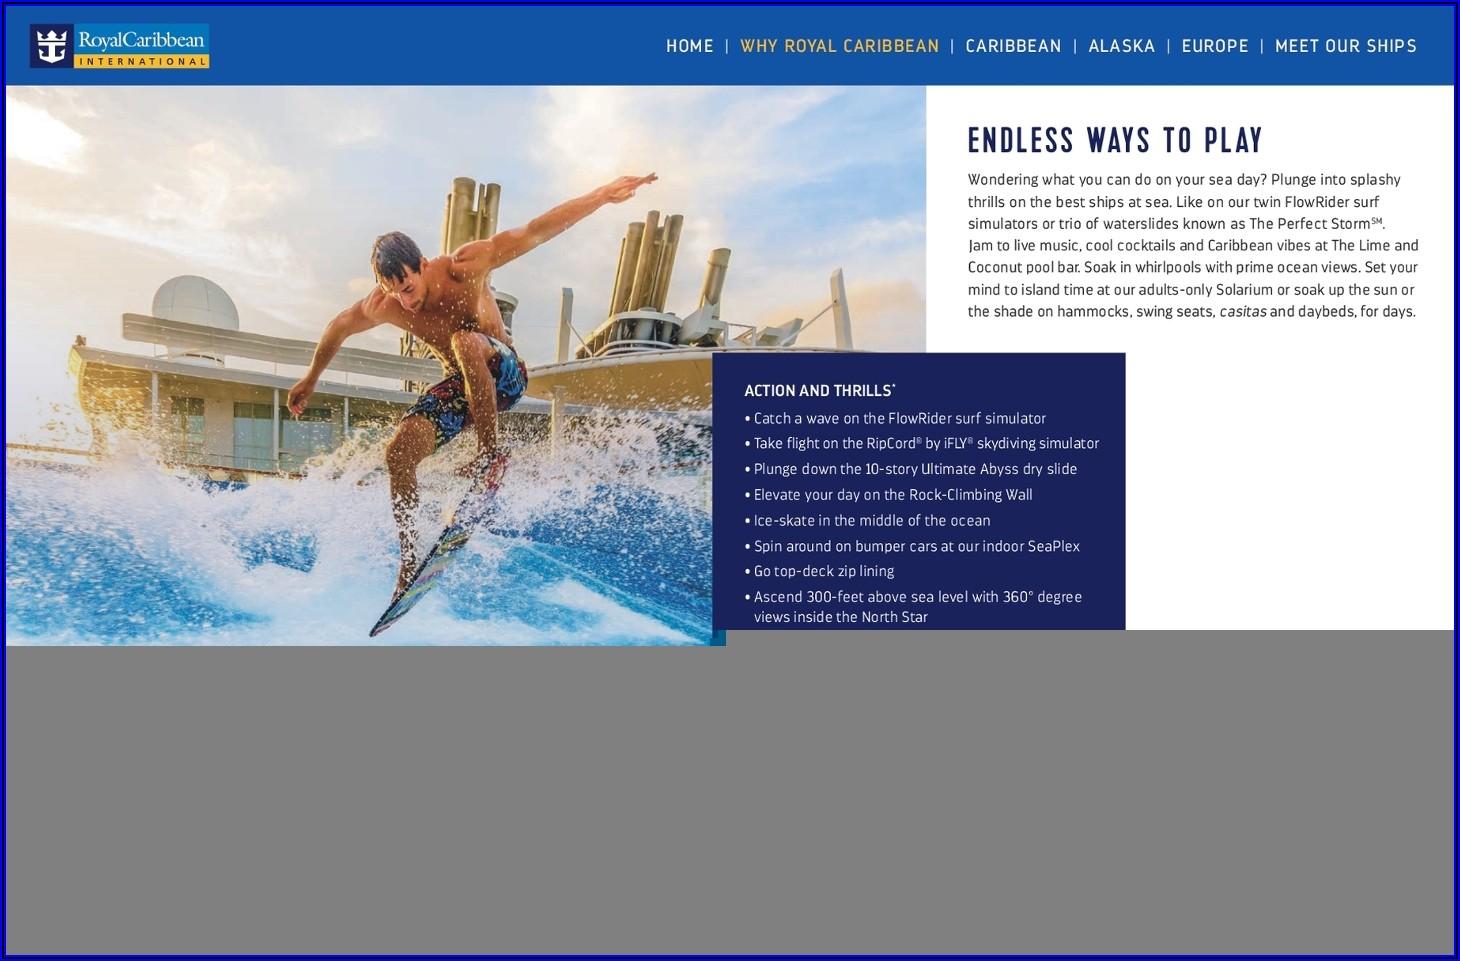 Royal Caribbean Brochure Shore Excursions